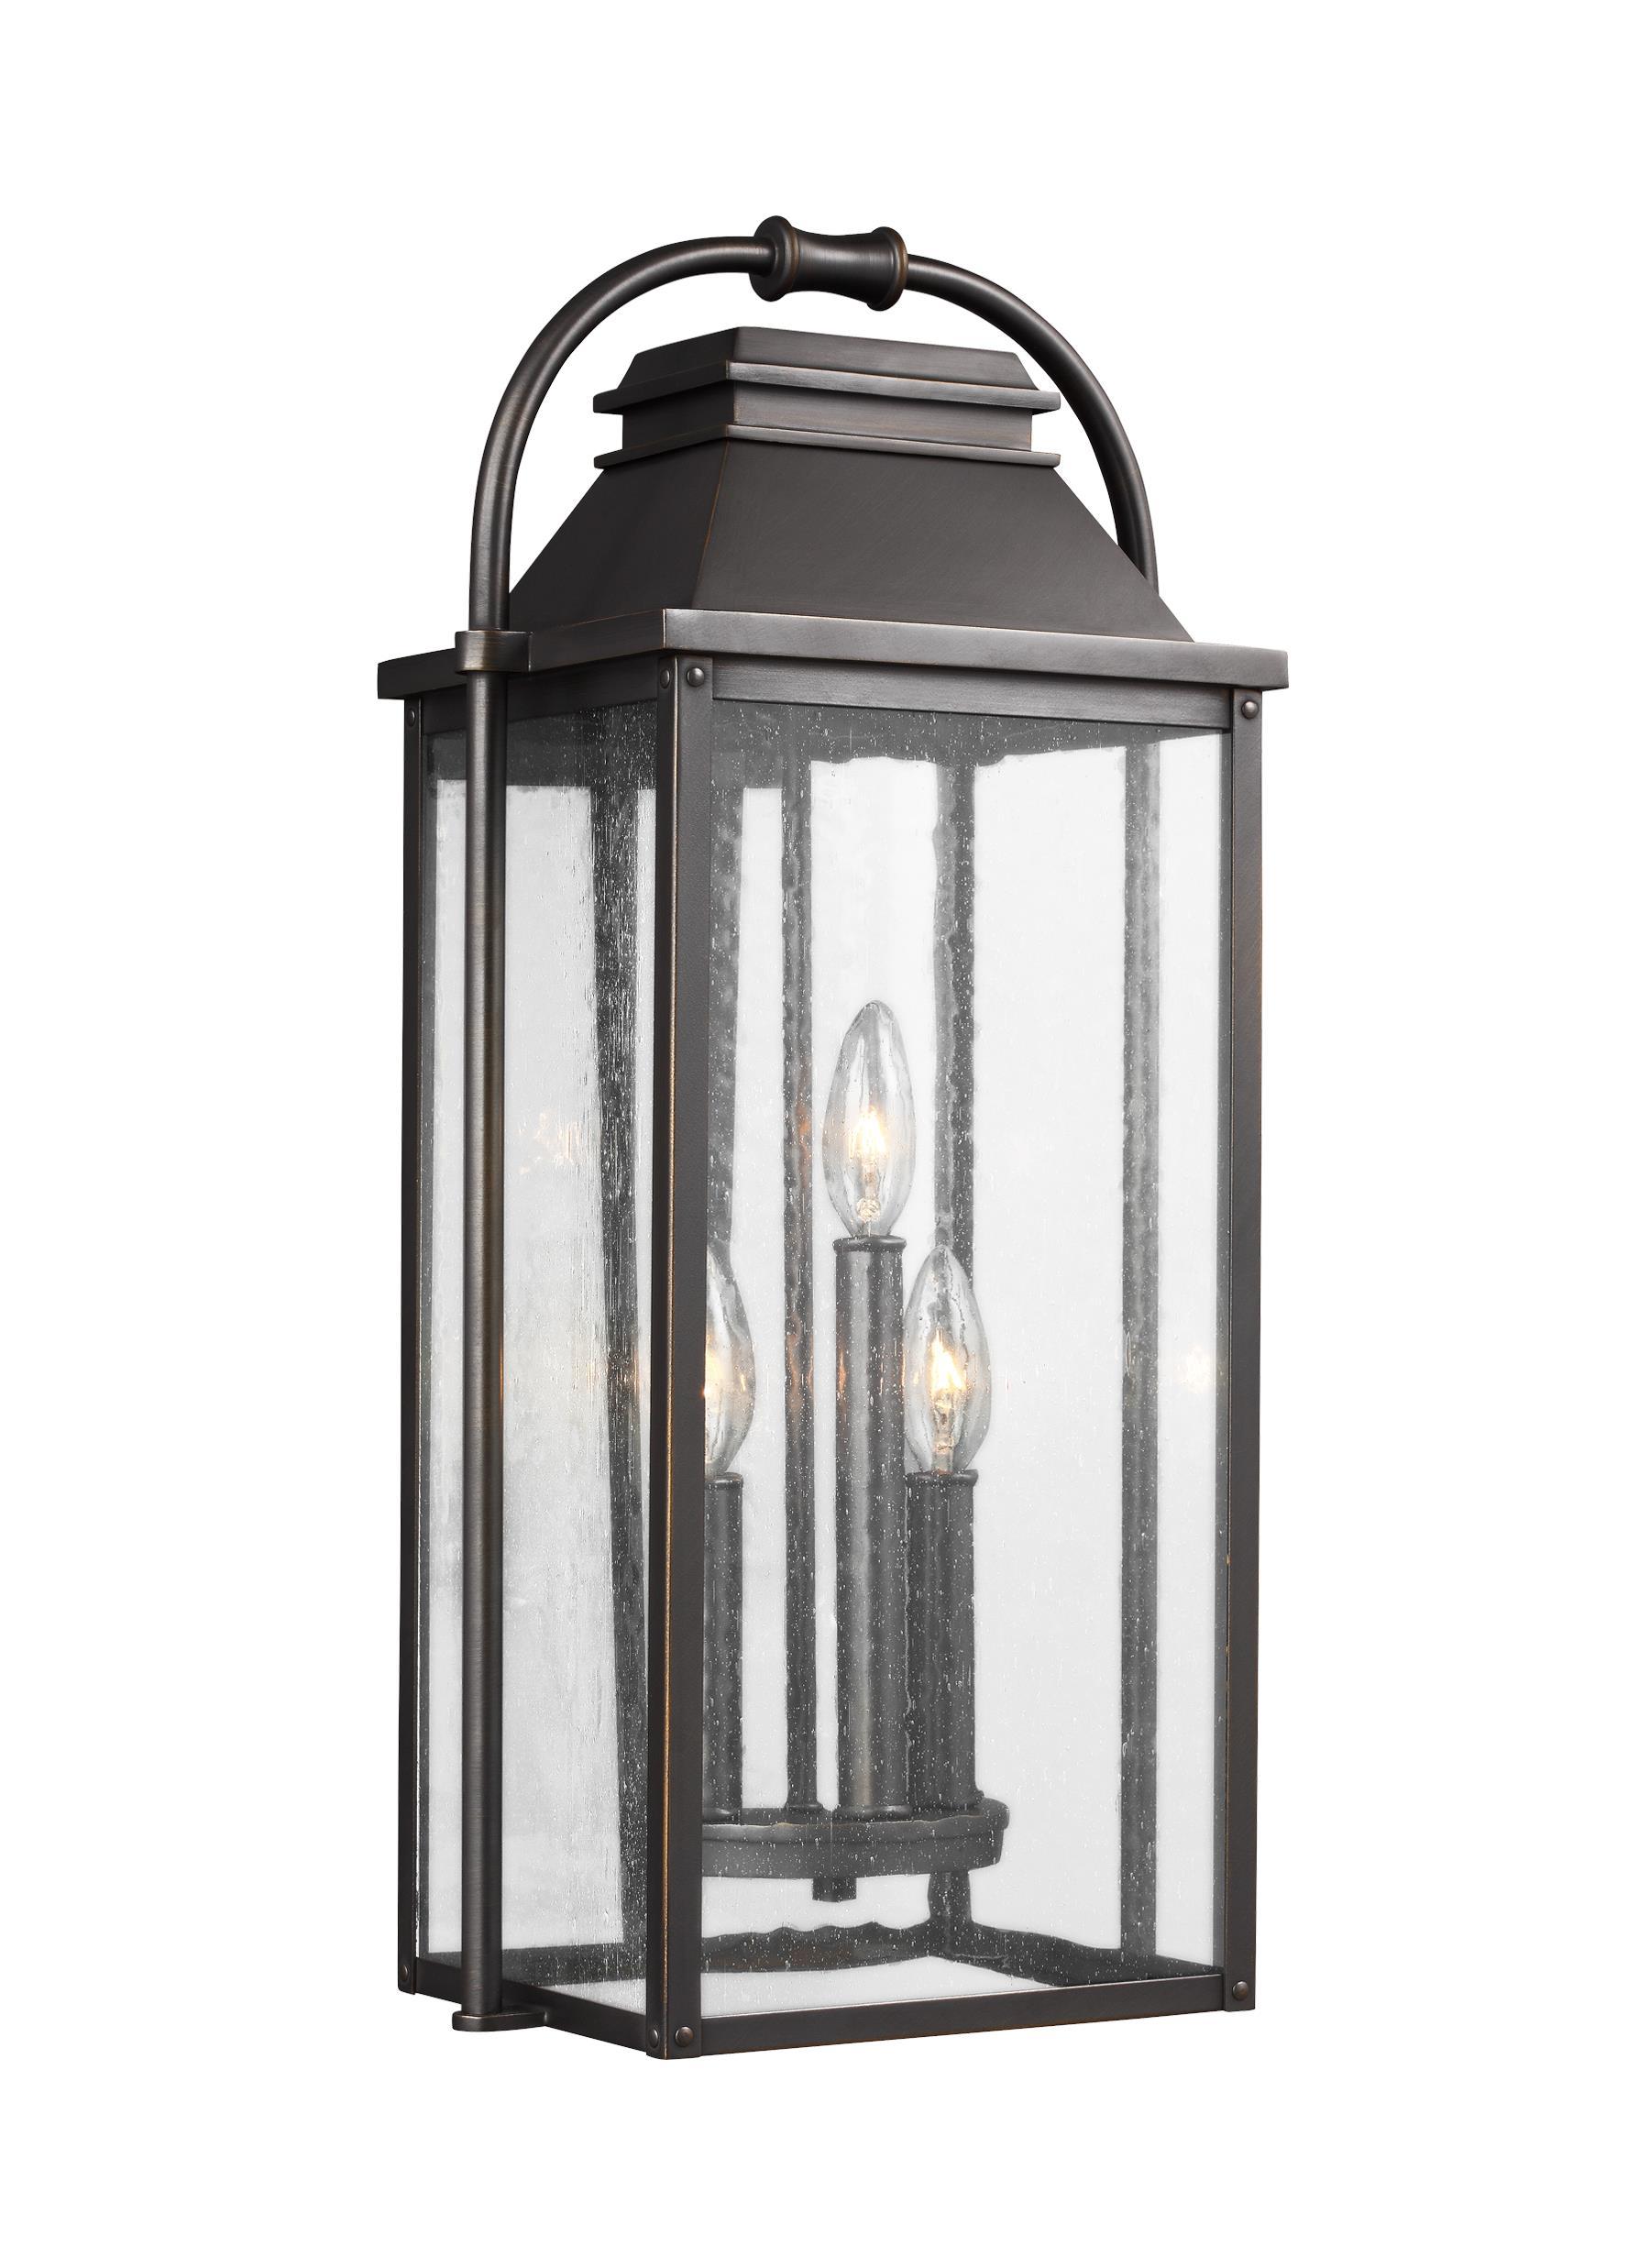 Ol13200pbs3 light outdoor wall lanternpainted brushed steel 3 light outdoor wall lantern workwithnaturefo